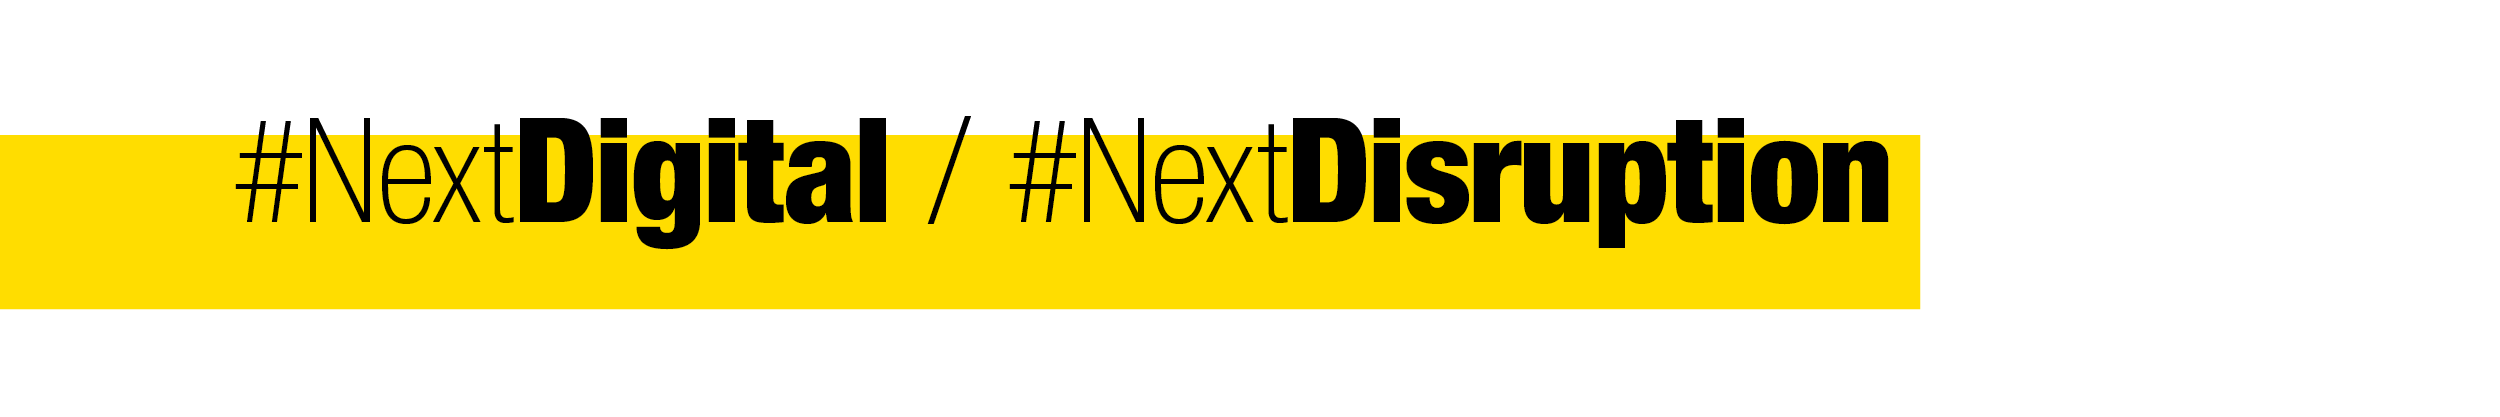 #NextDigital / NextDisruption